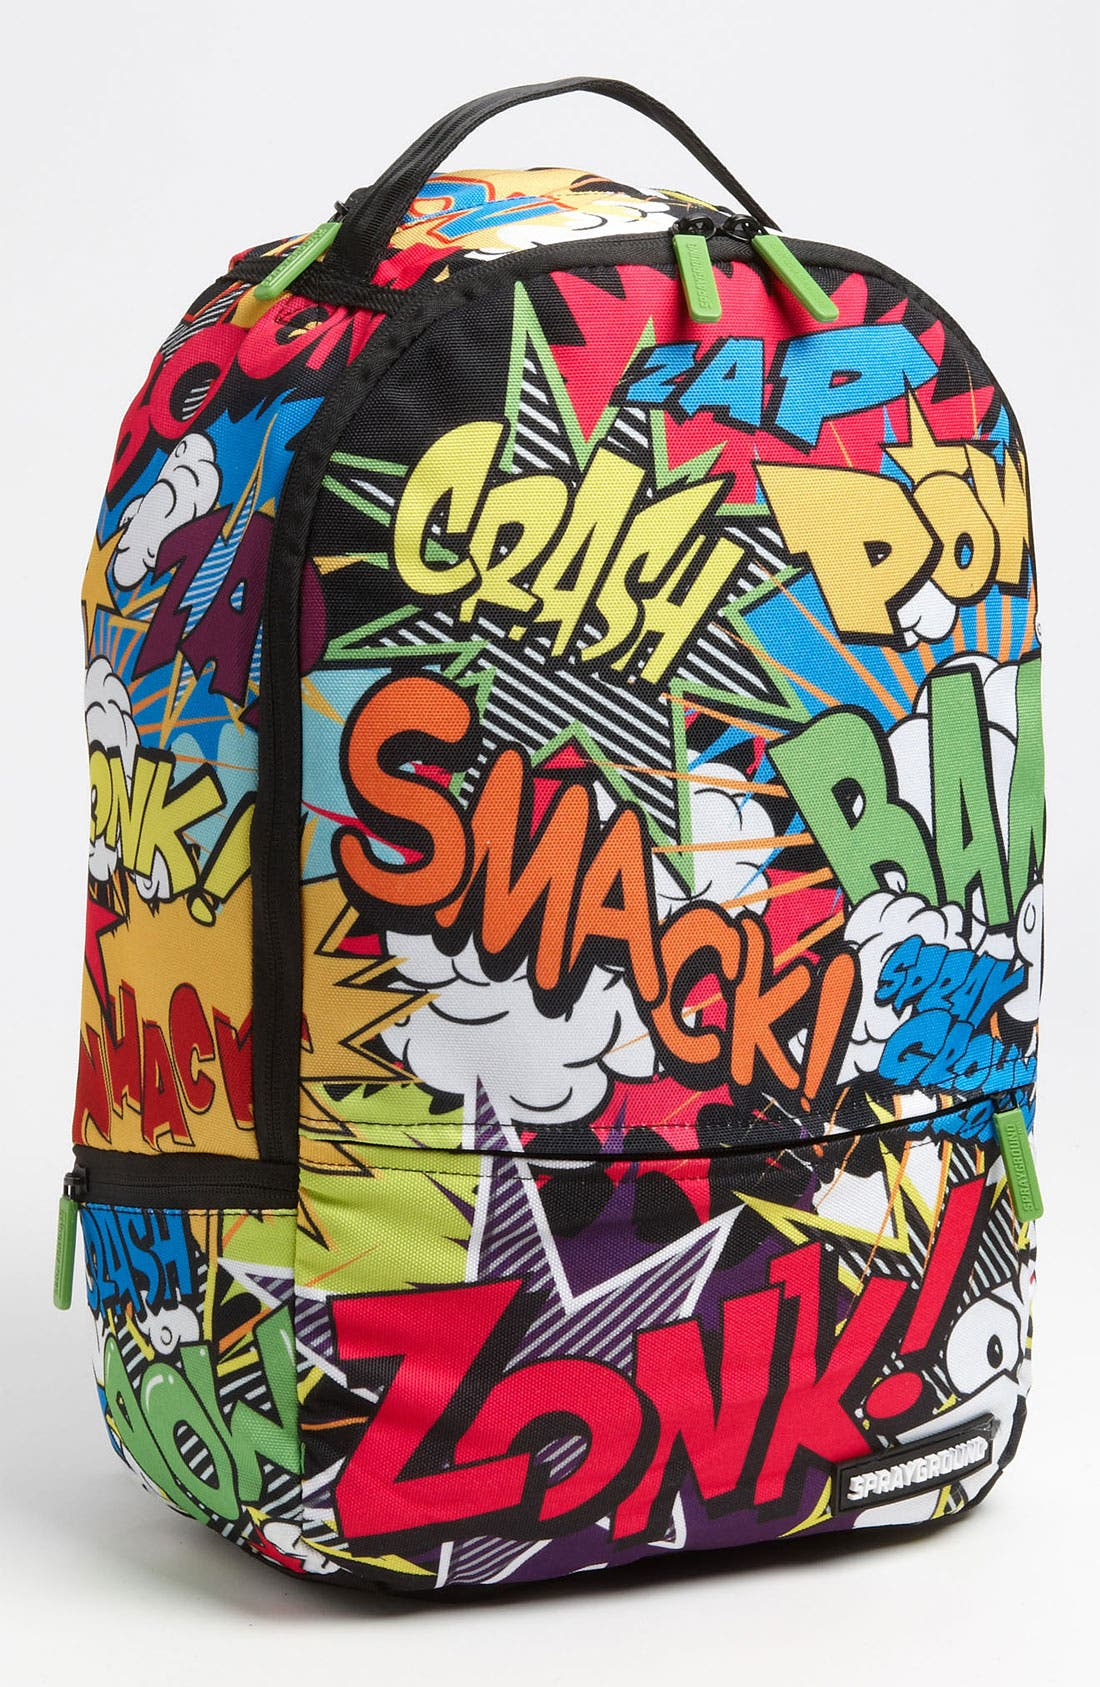 Alternate Image 1 Selected - Sprayground 'POW' Backpack